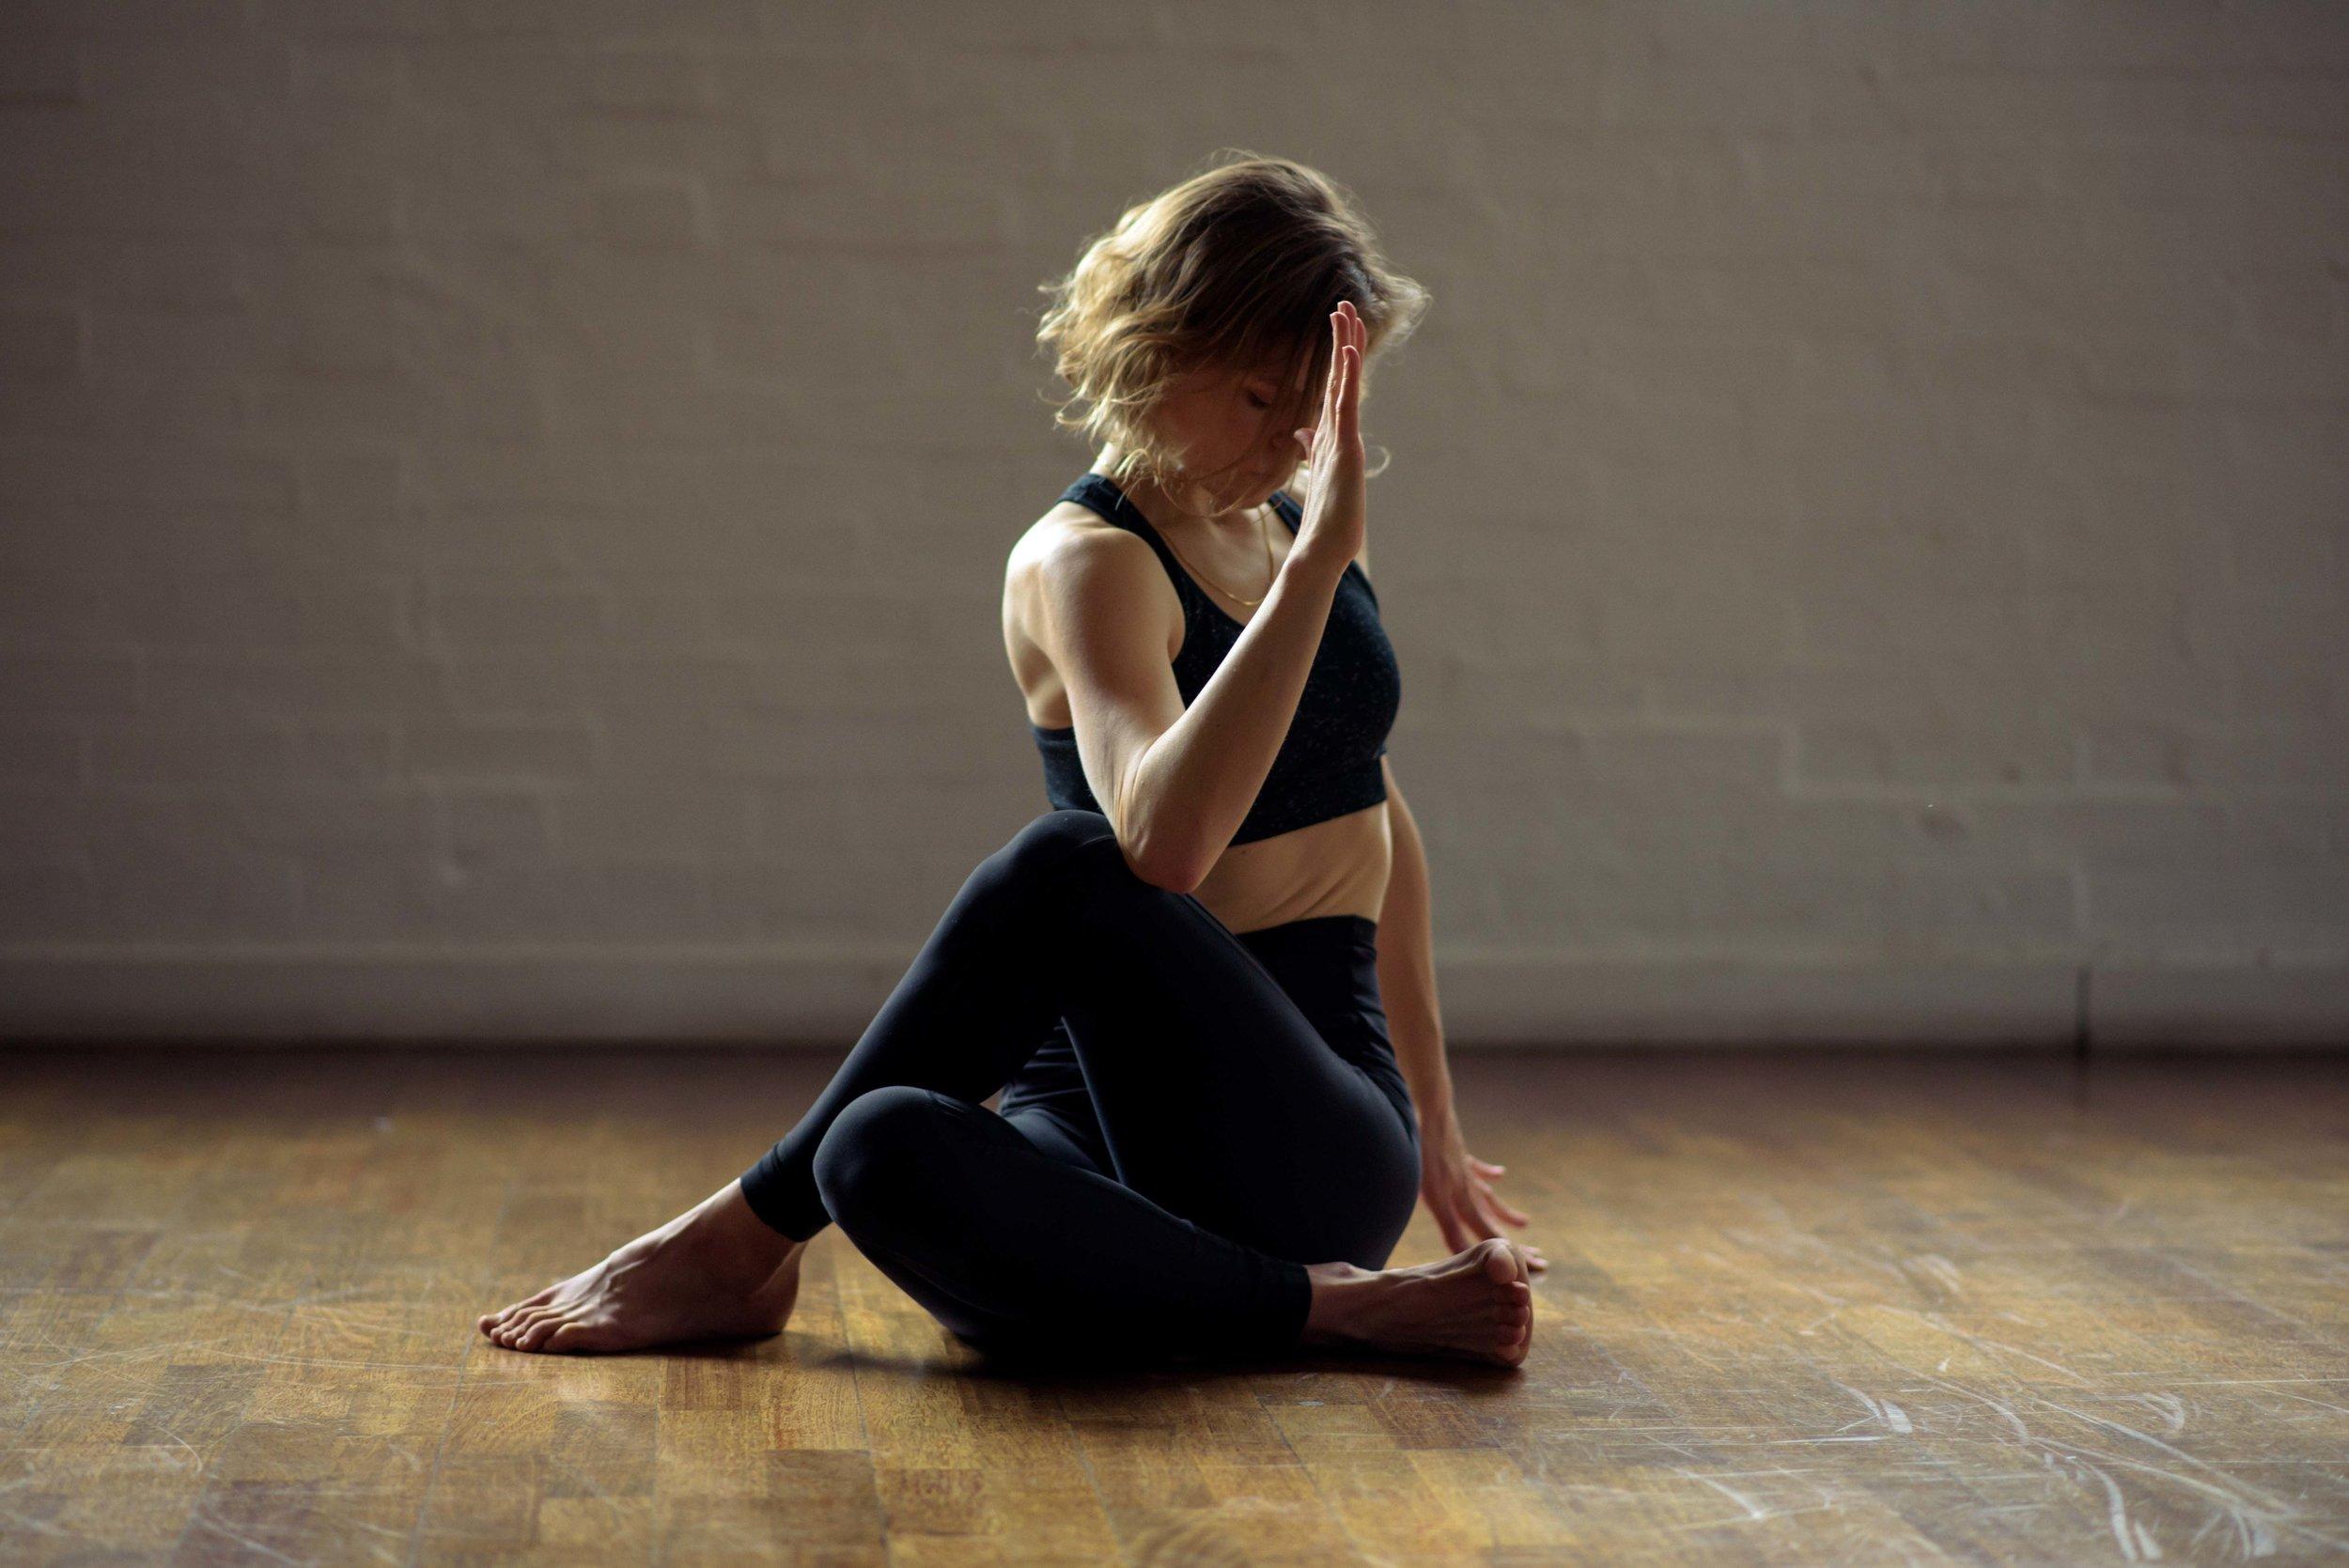 Lululemon yoga photoshoot